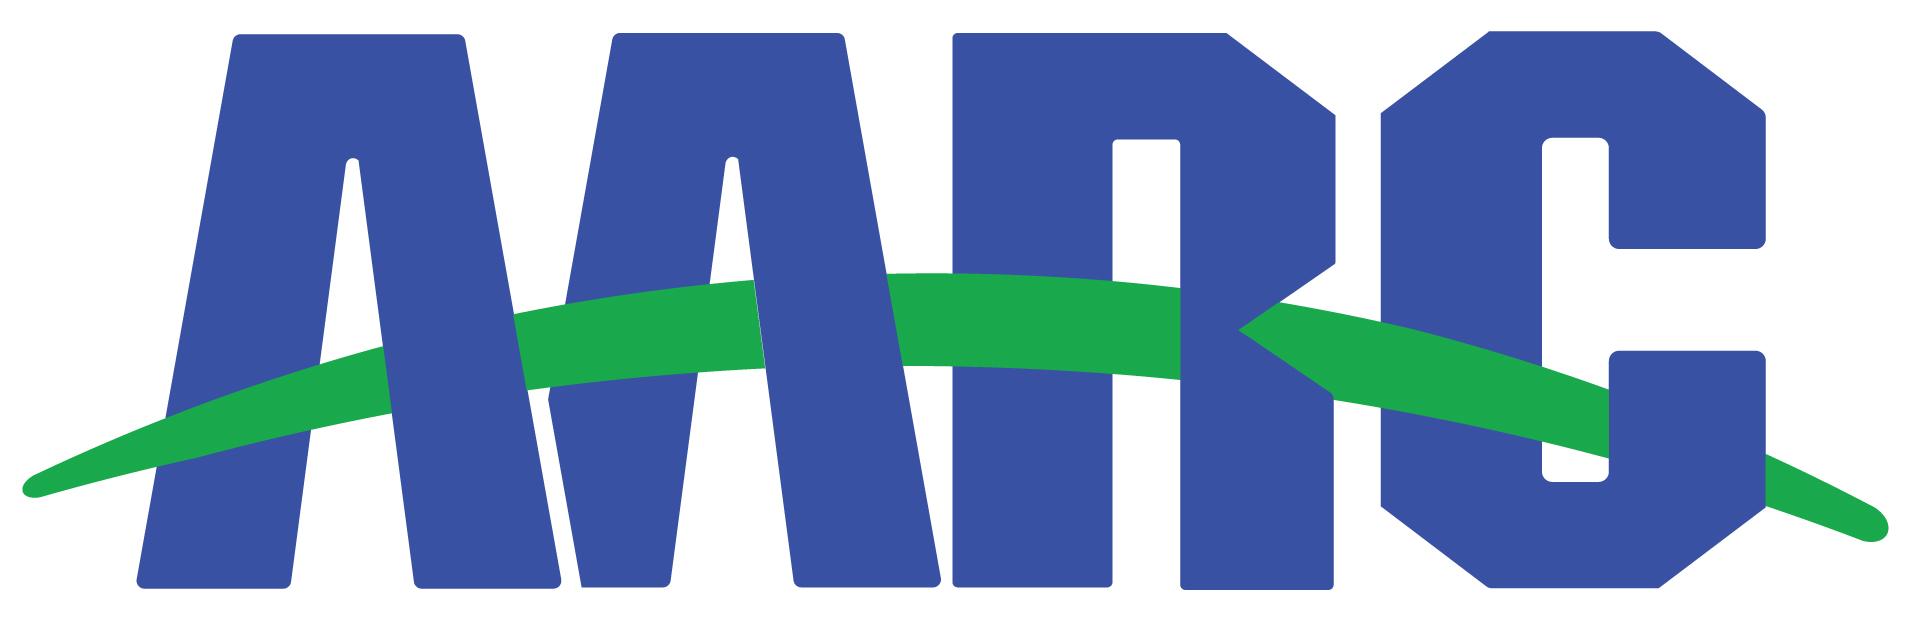 AARC Group Logo